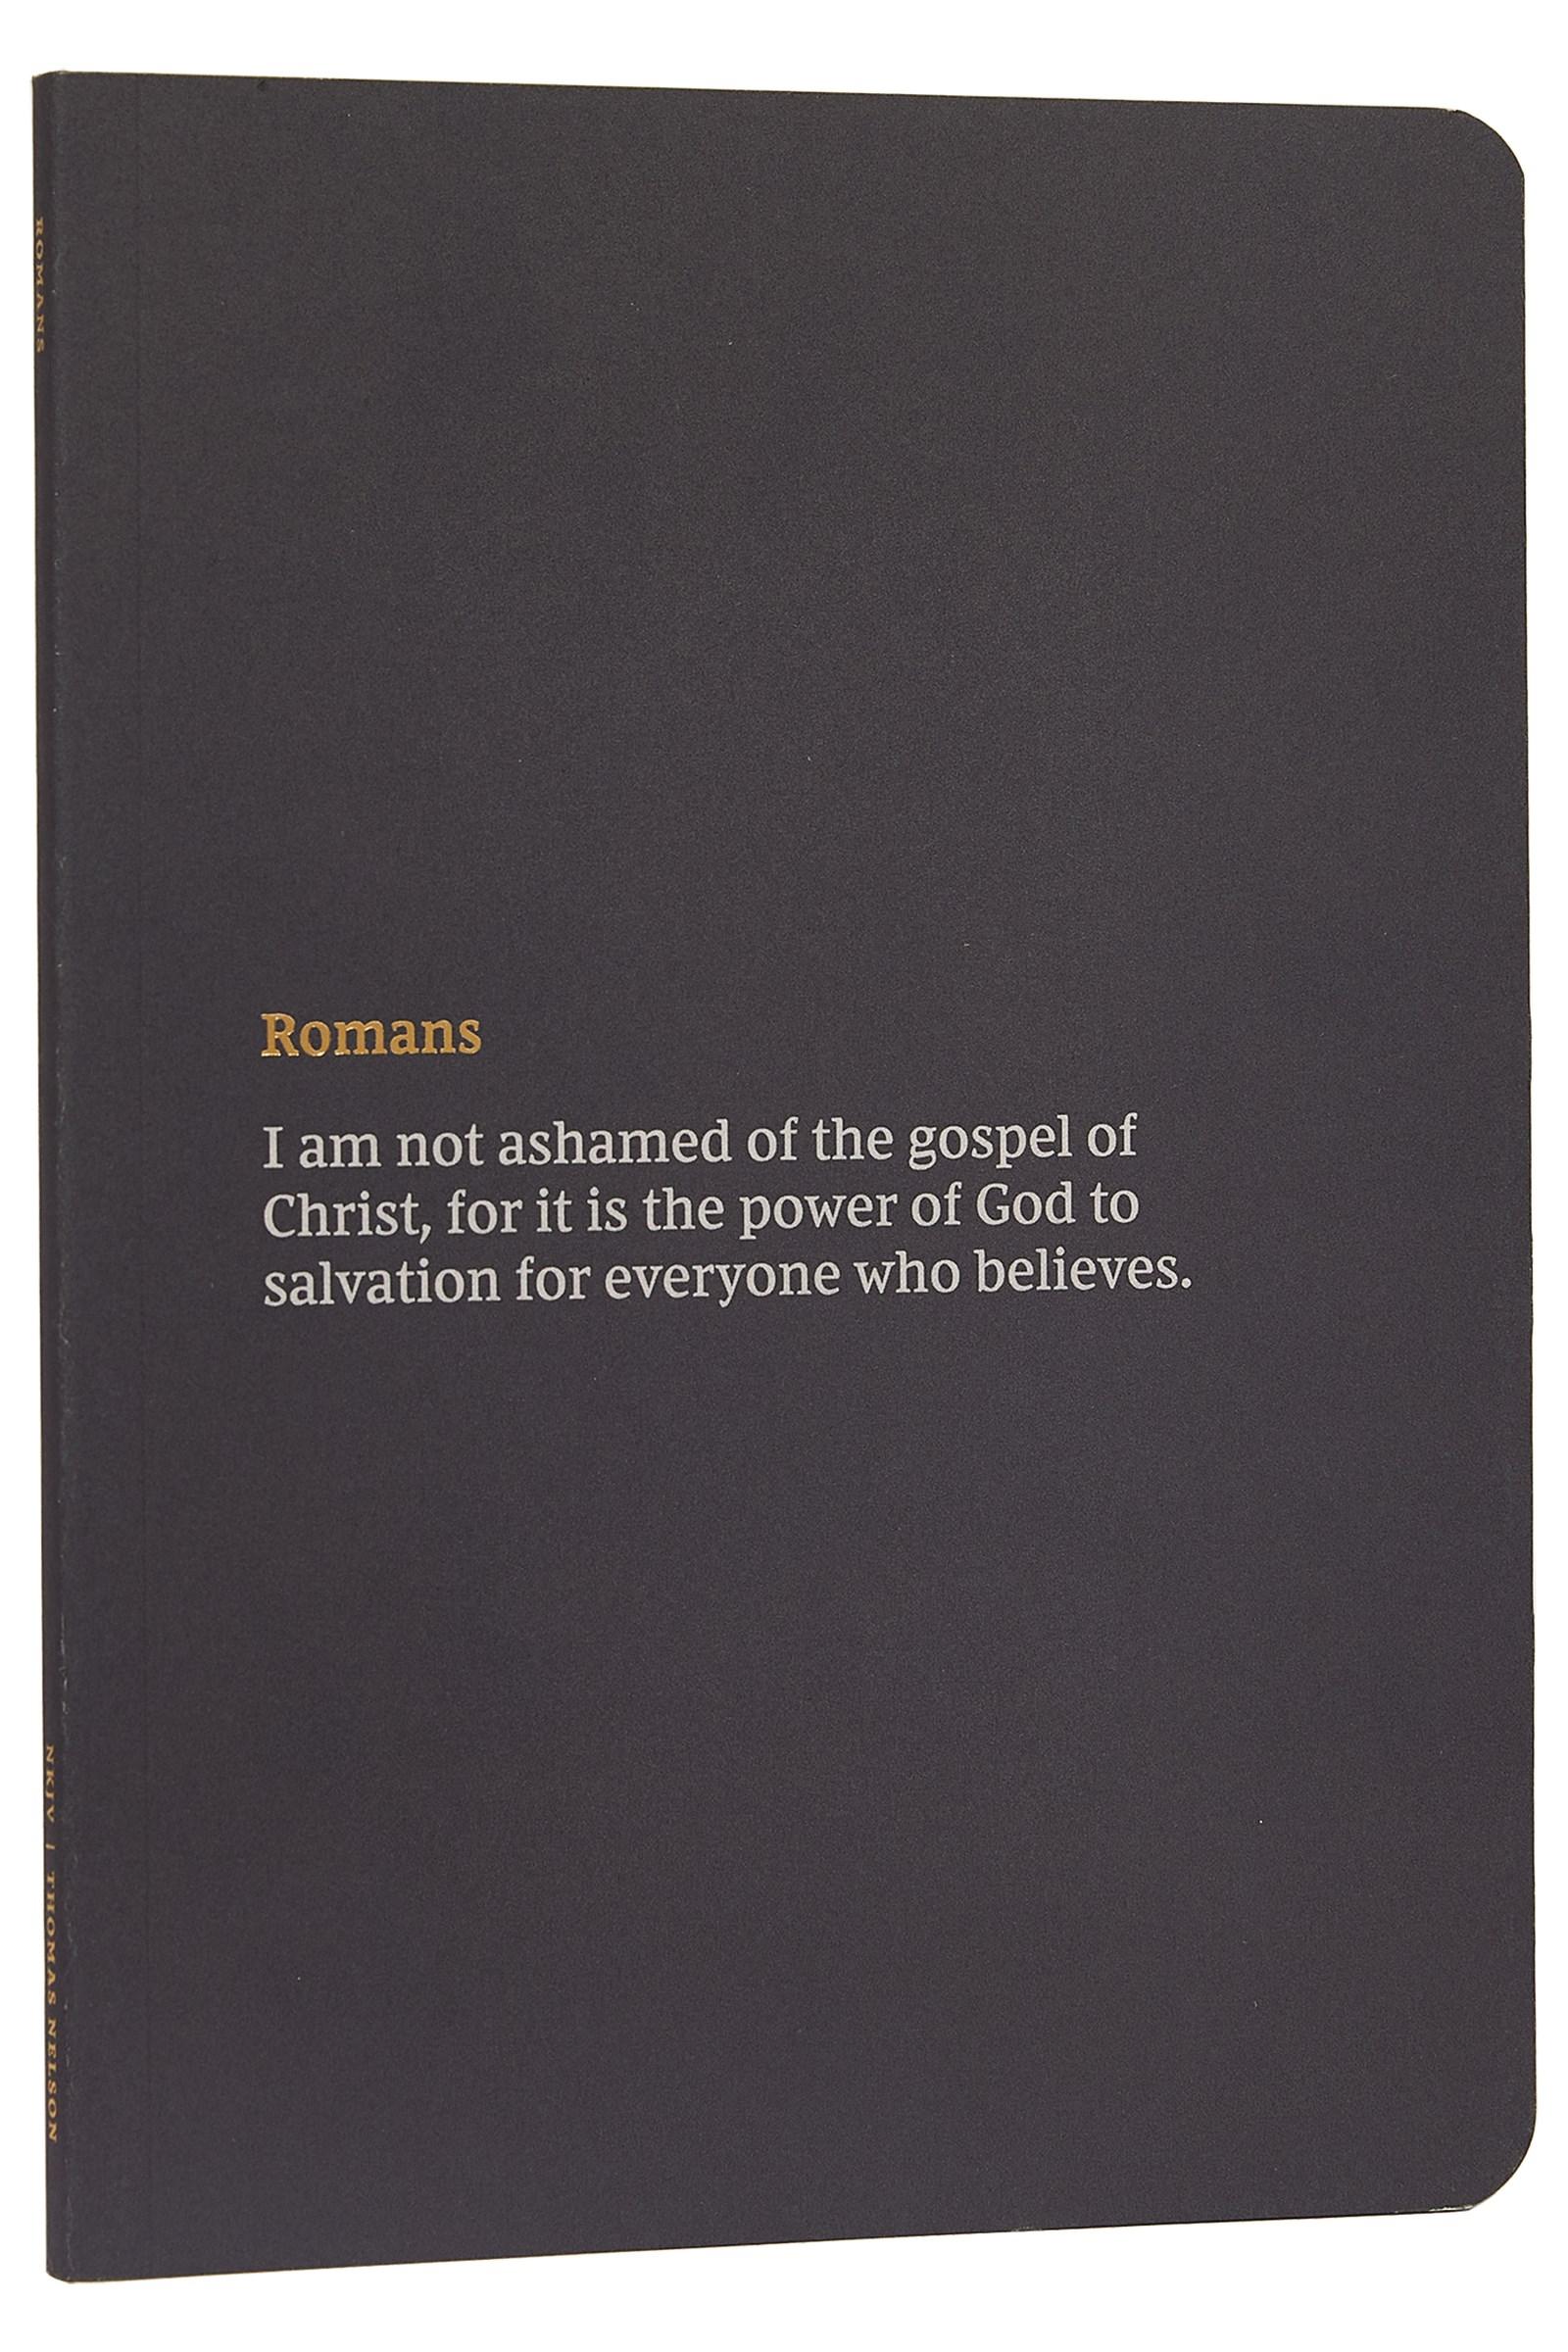 NKJV Bible Journal: Romans-Softcover